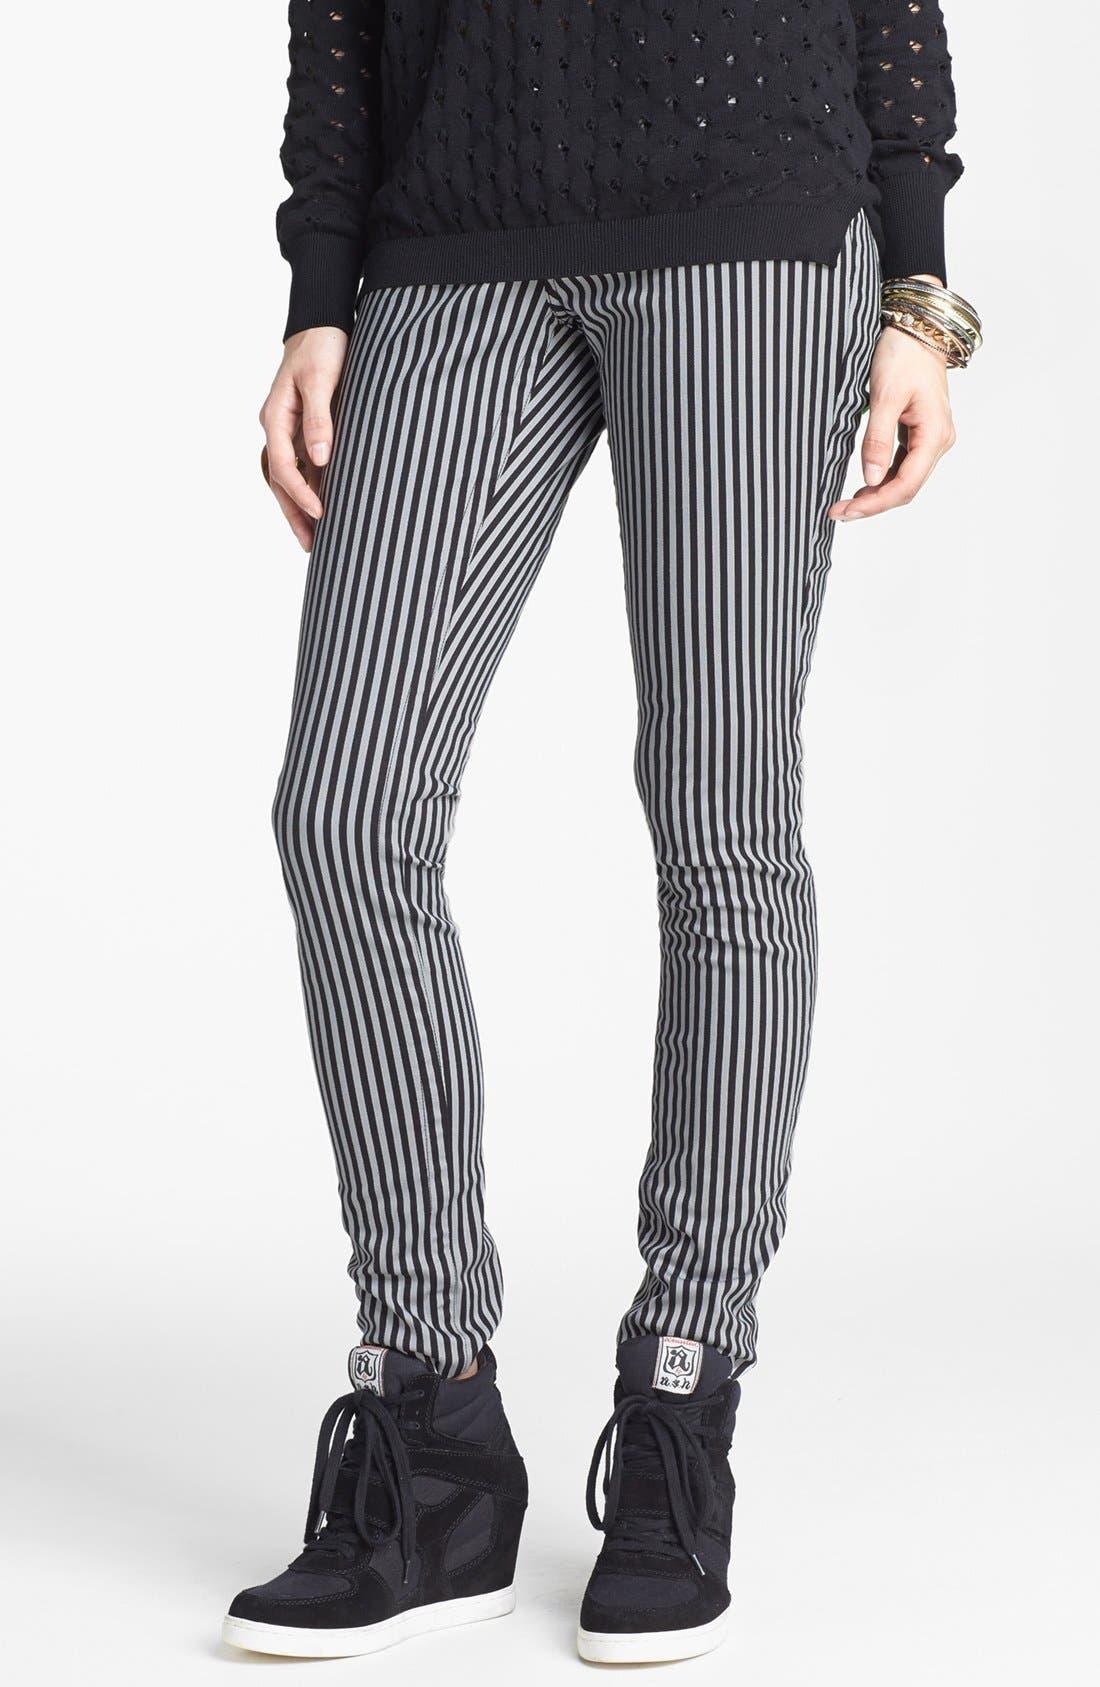 Alternate Image 1 Selected - INSTANT VINTAGE Stretch Denim Stripe Skinny Jeans (Juniors)